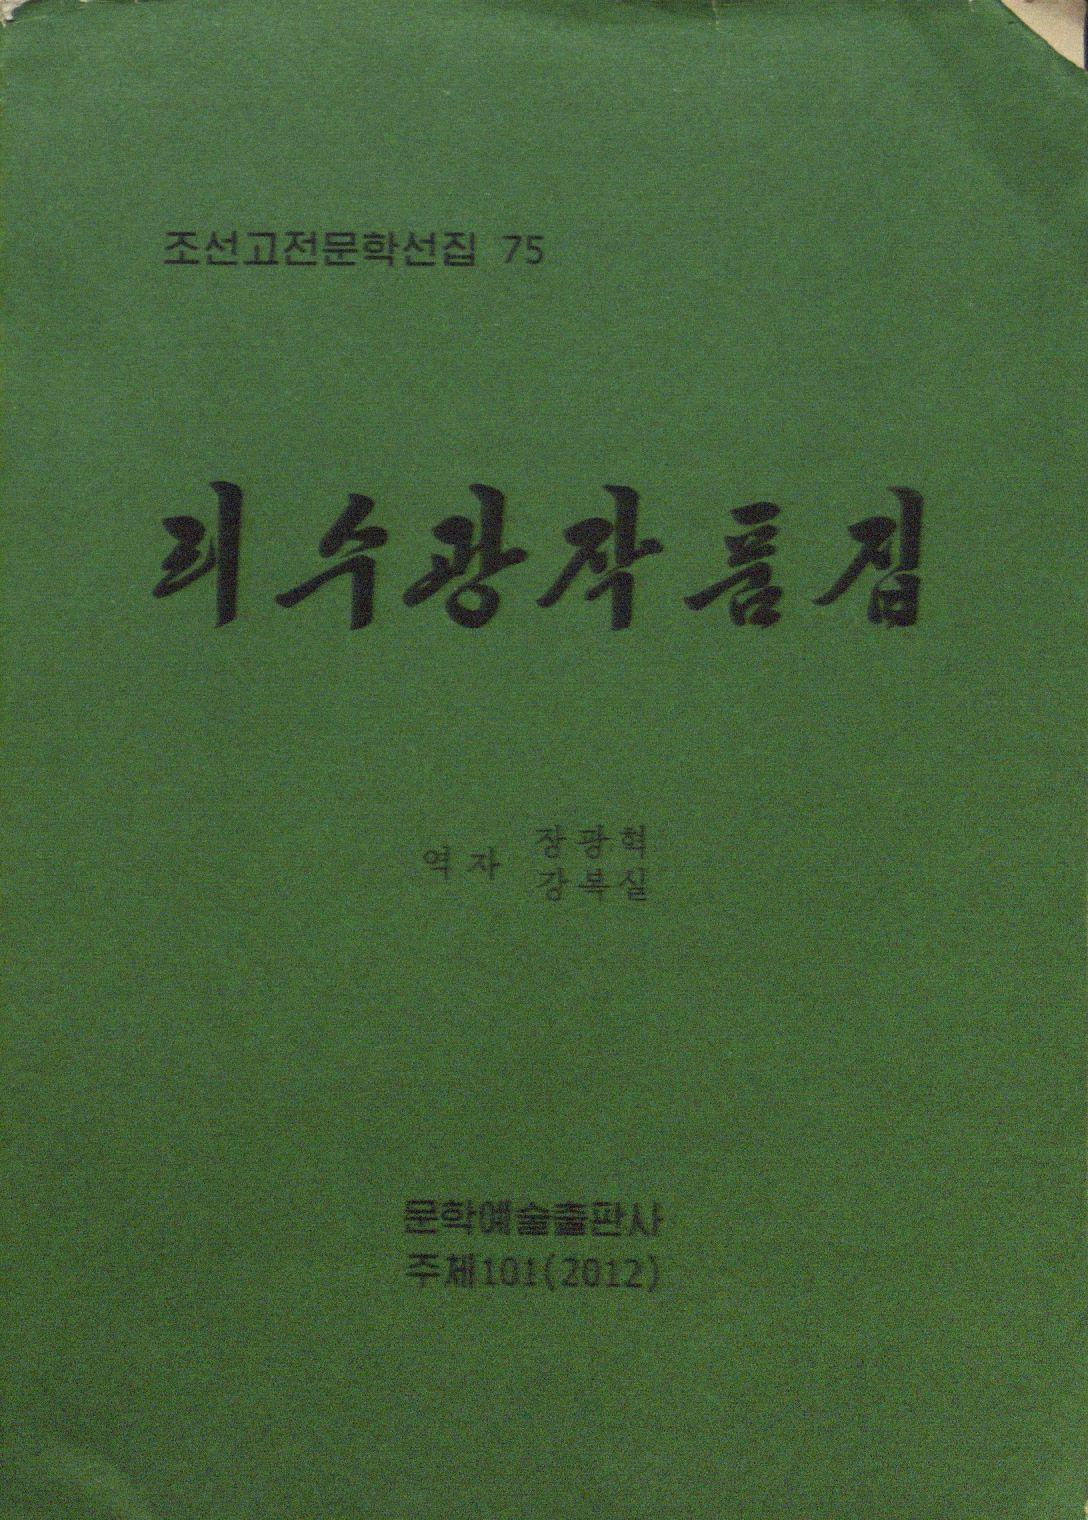 title page of 리수광 작품집